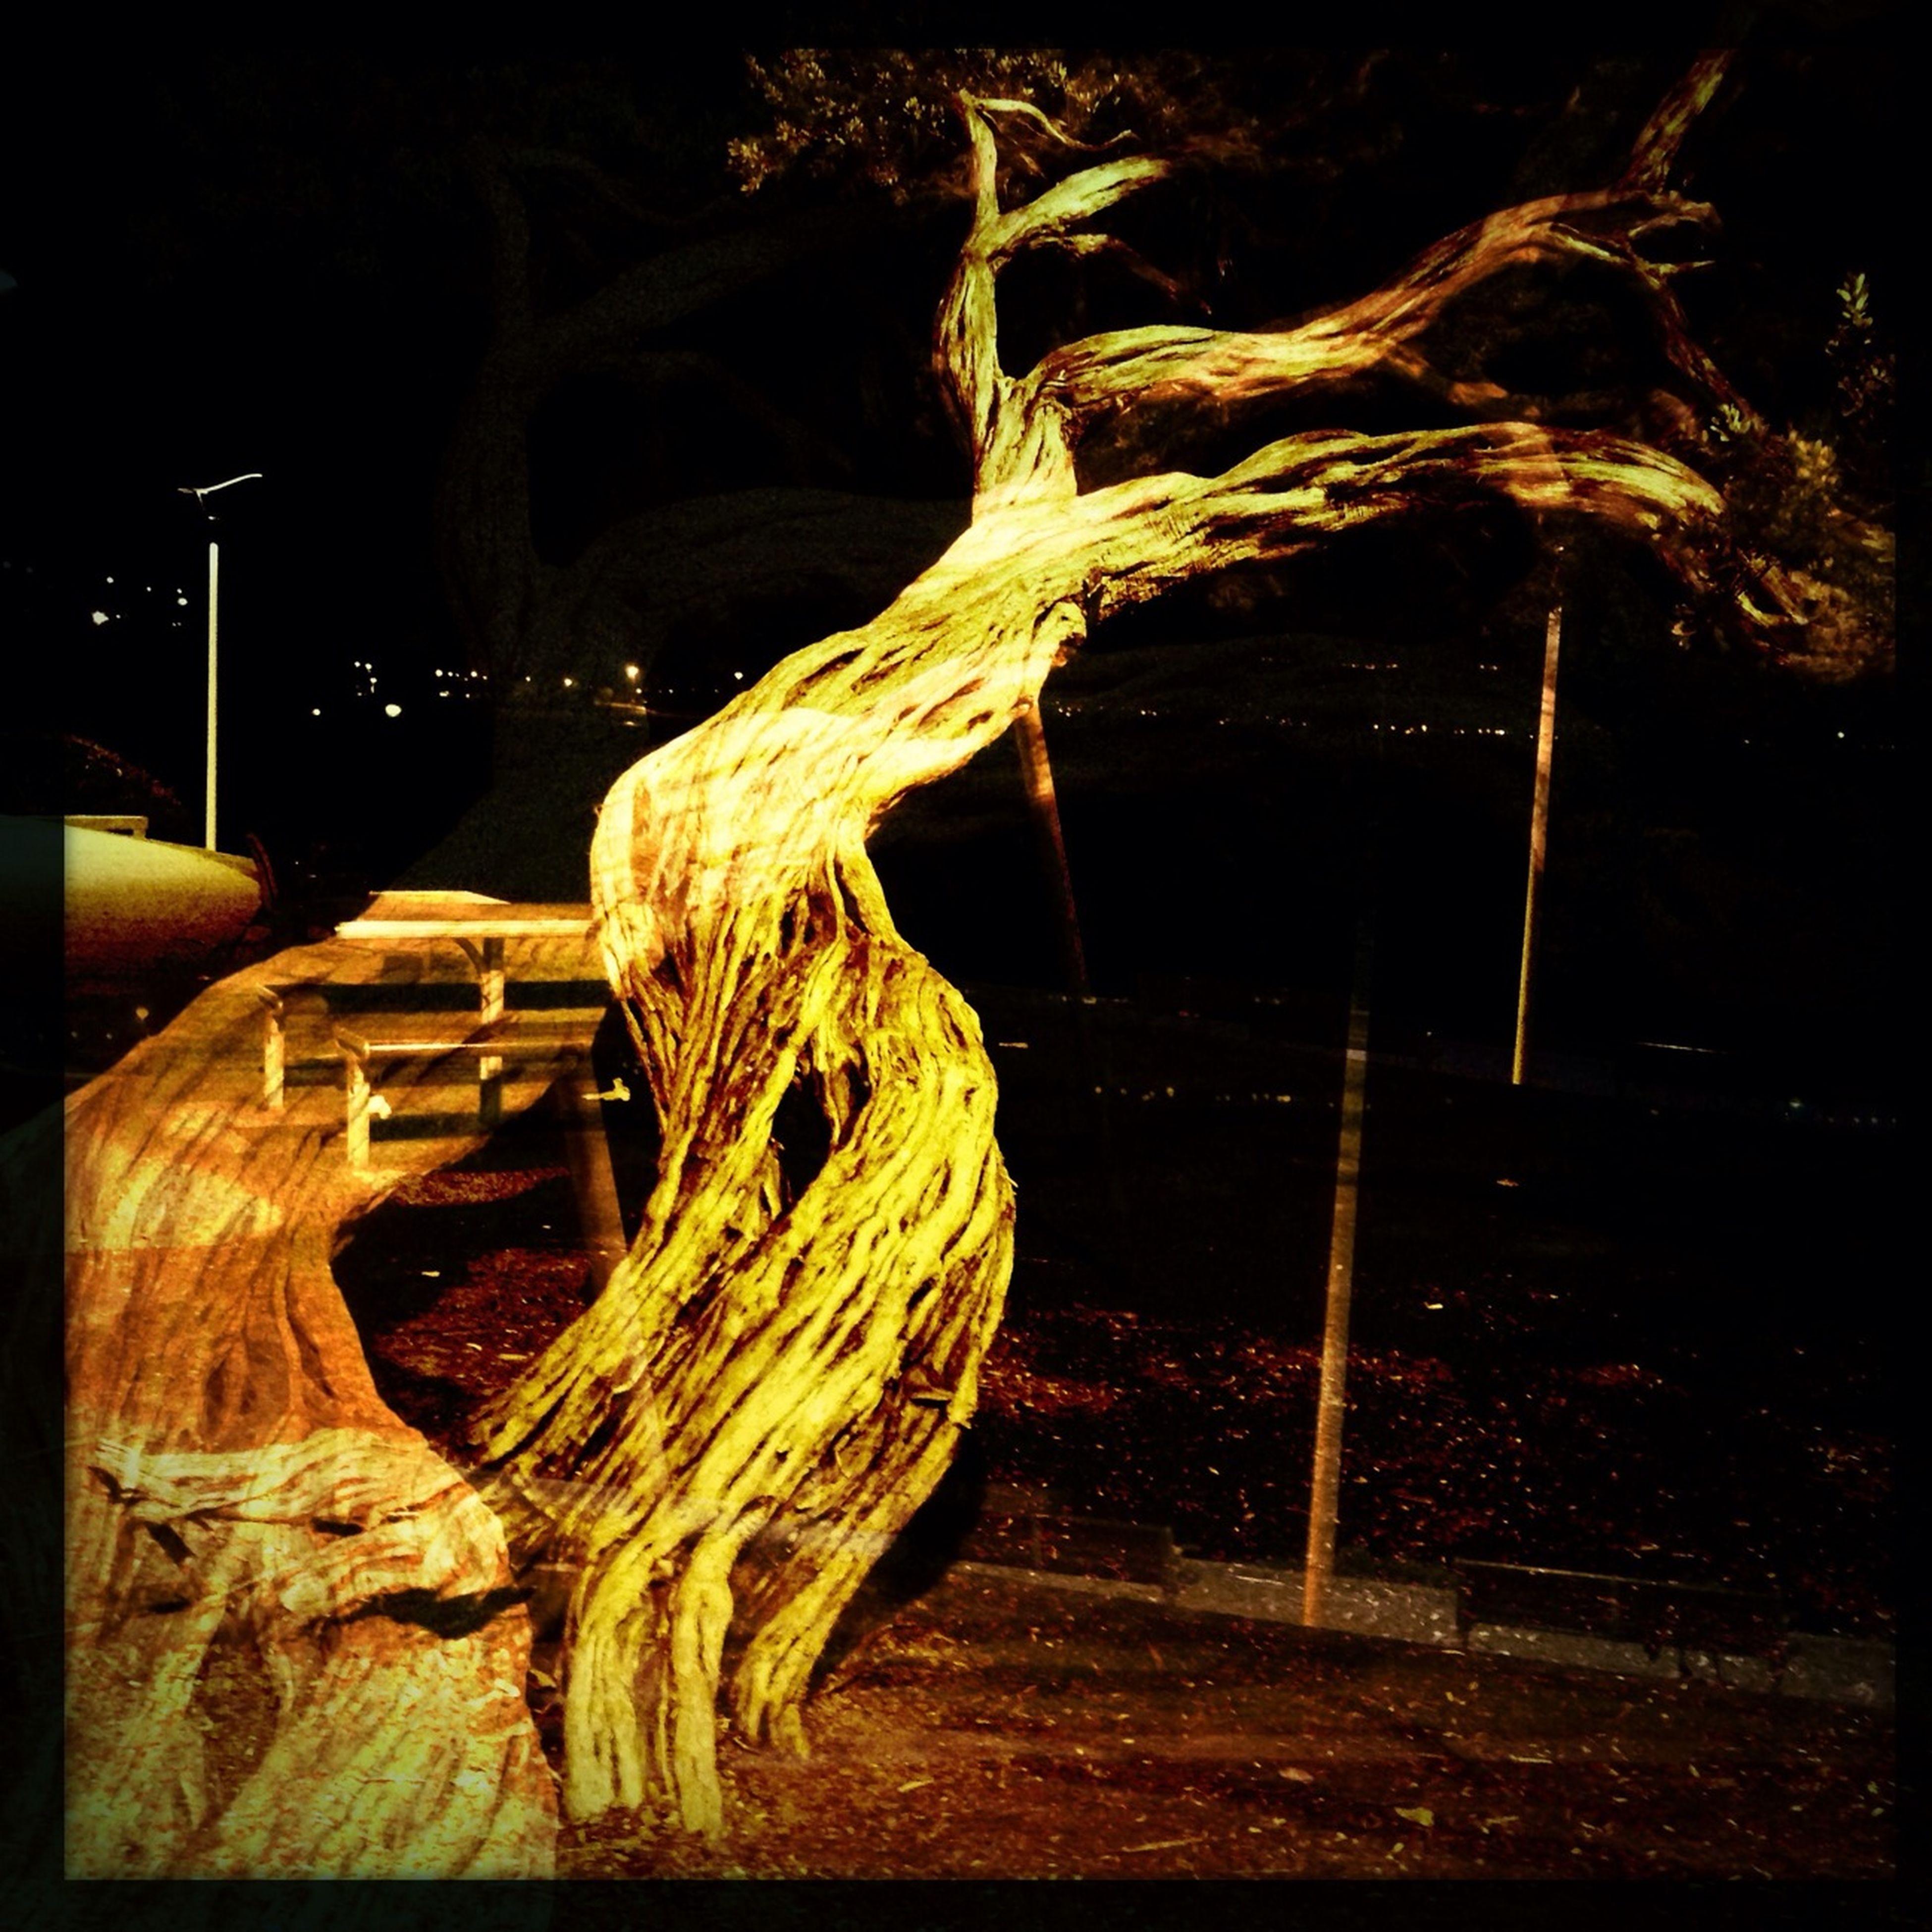 night, wood - material, illuminated, tree, outdoors, no people, dark, firewood, wood, field, auto post production filter, log, fence, close-up, nature, bare tree, tree trunk, dry, light - natural phenomenon, sunlight